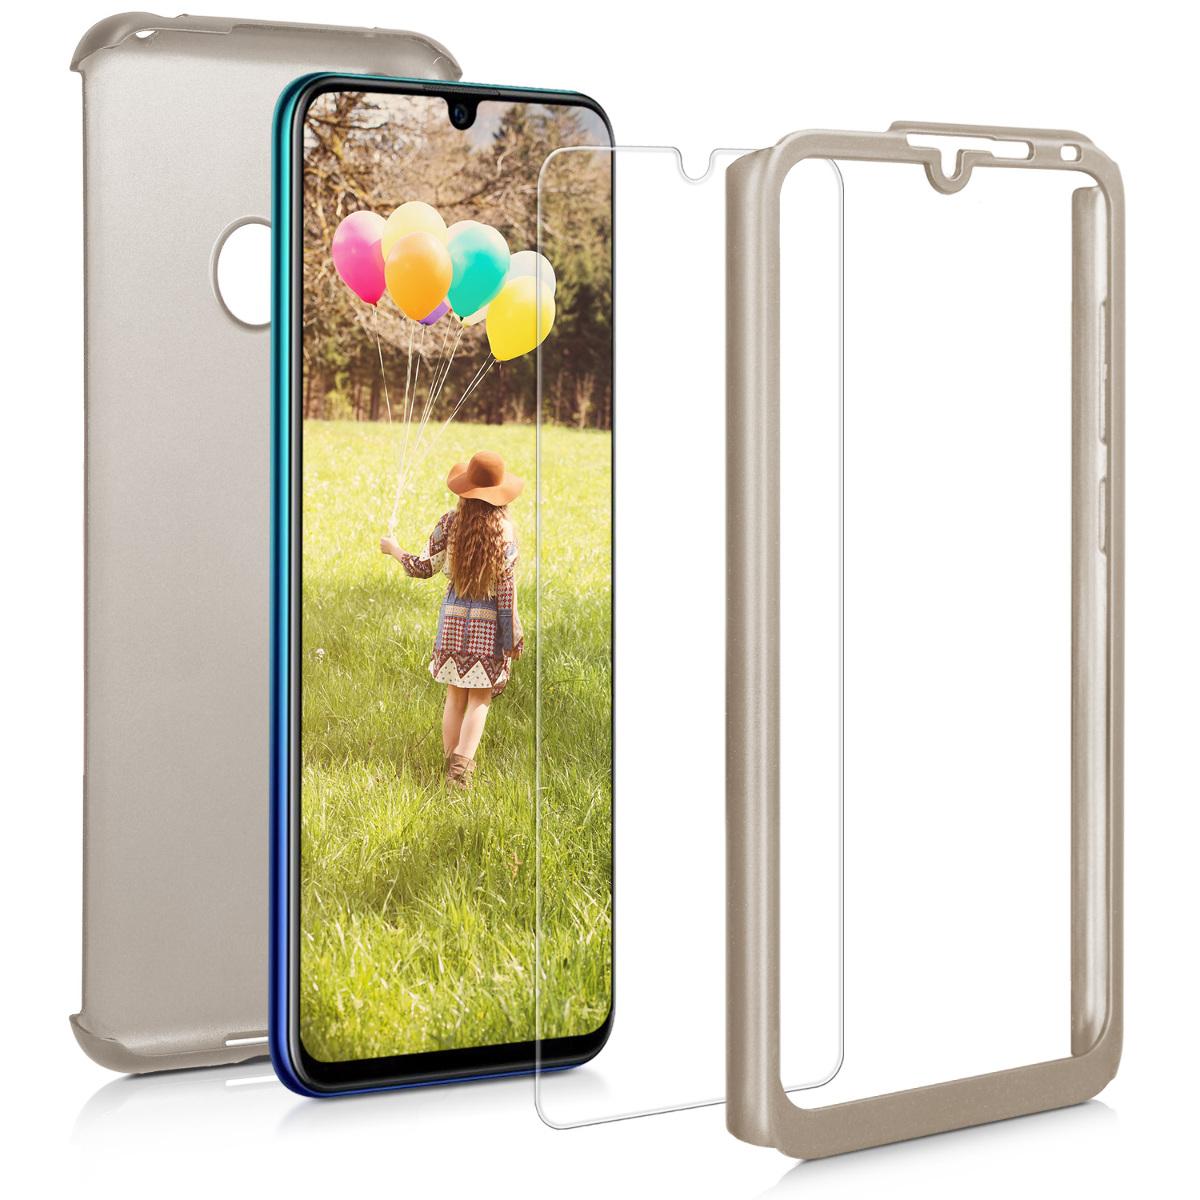 KW Θήκη Full Body Huawei Y7 2019 / Y7 Prime 2019 & Tempered Glass - Metallic Gold (47665.66)